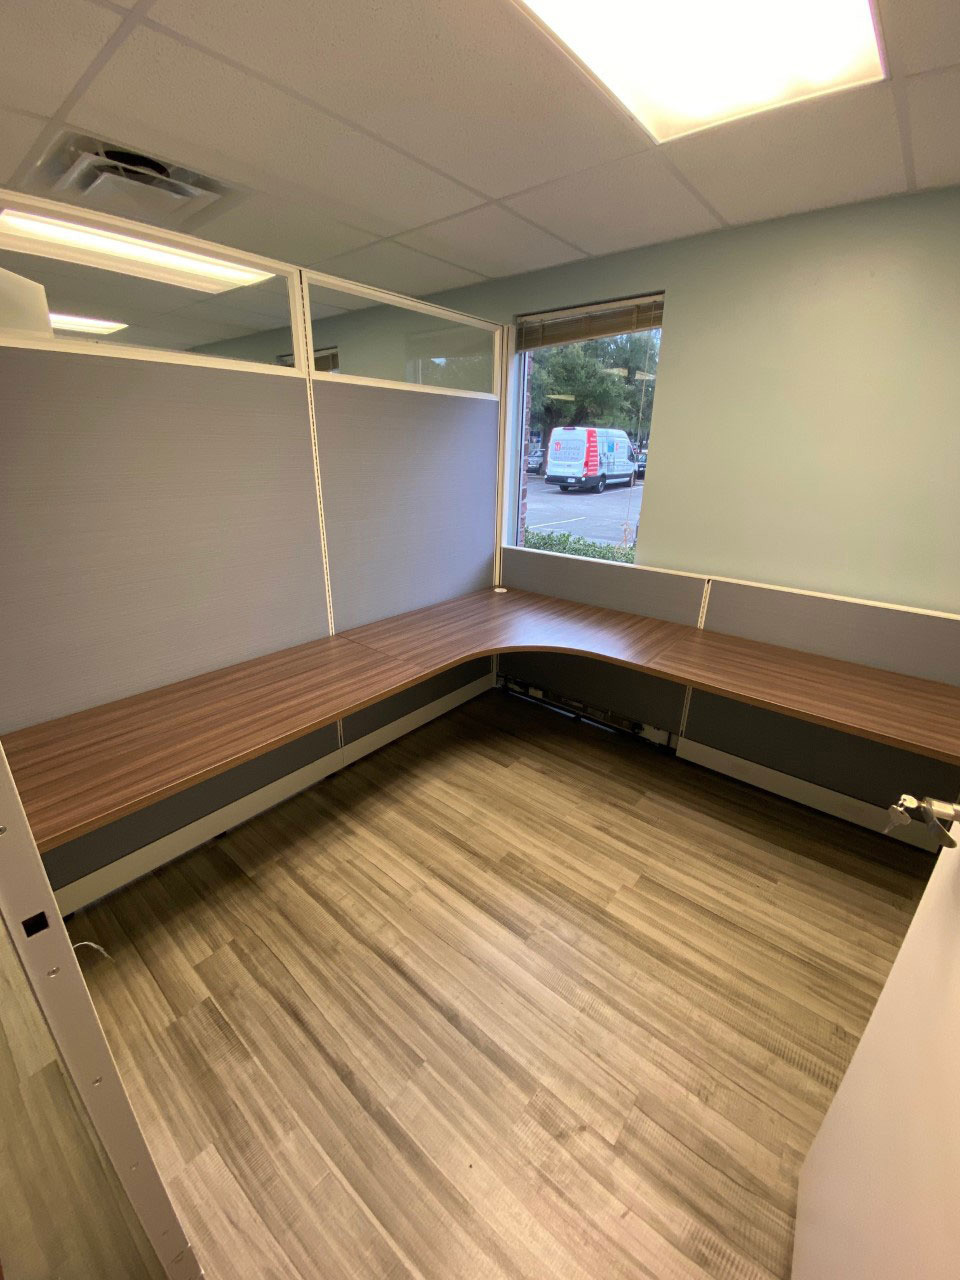 office-cubicle-furniture-suppliers-in-bradenton-florida-19.jpg